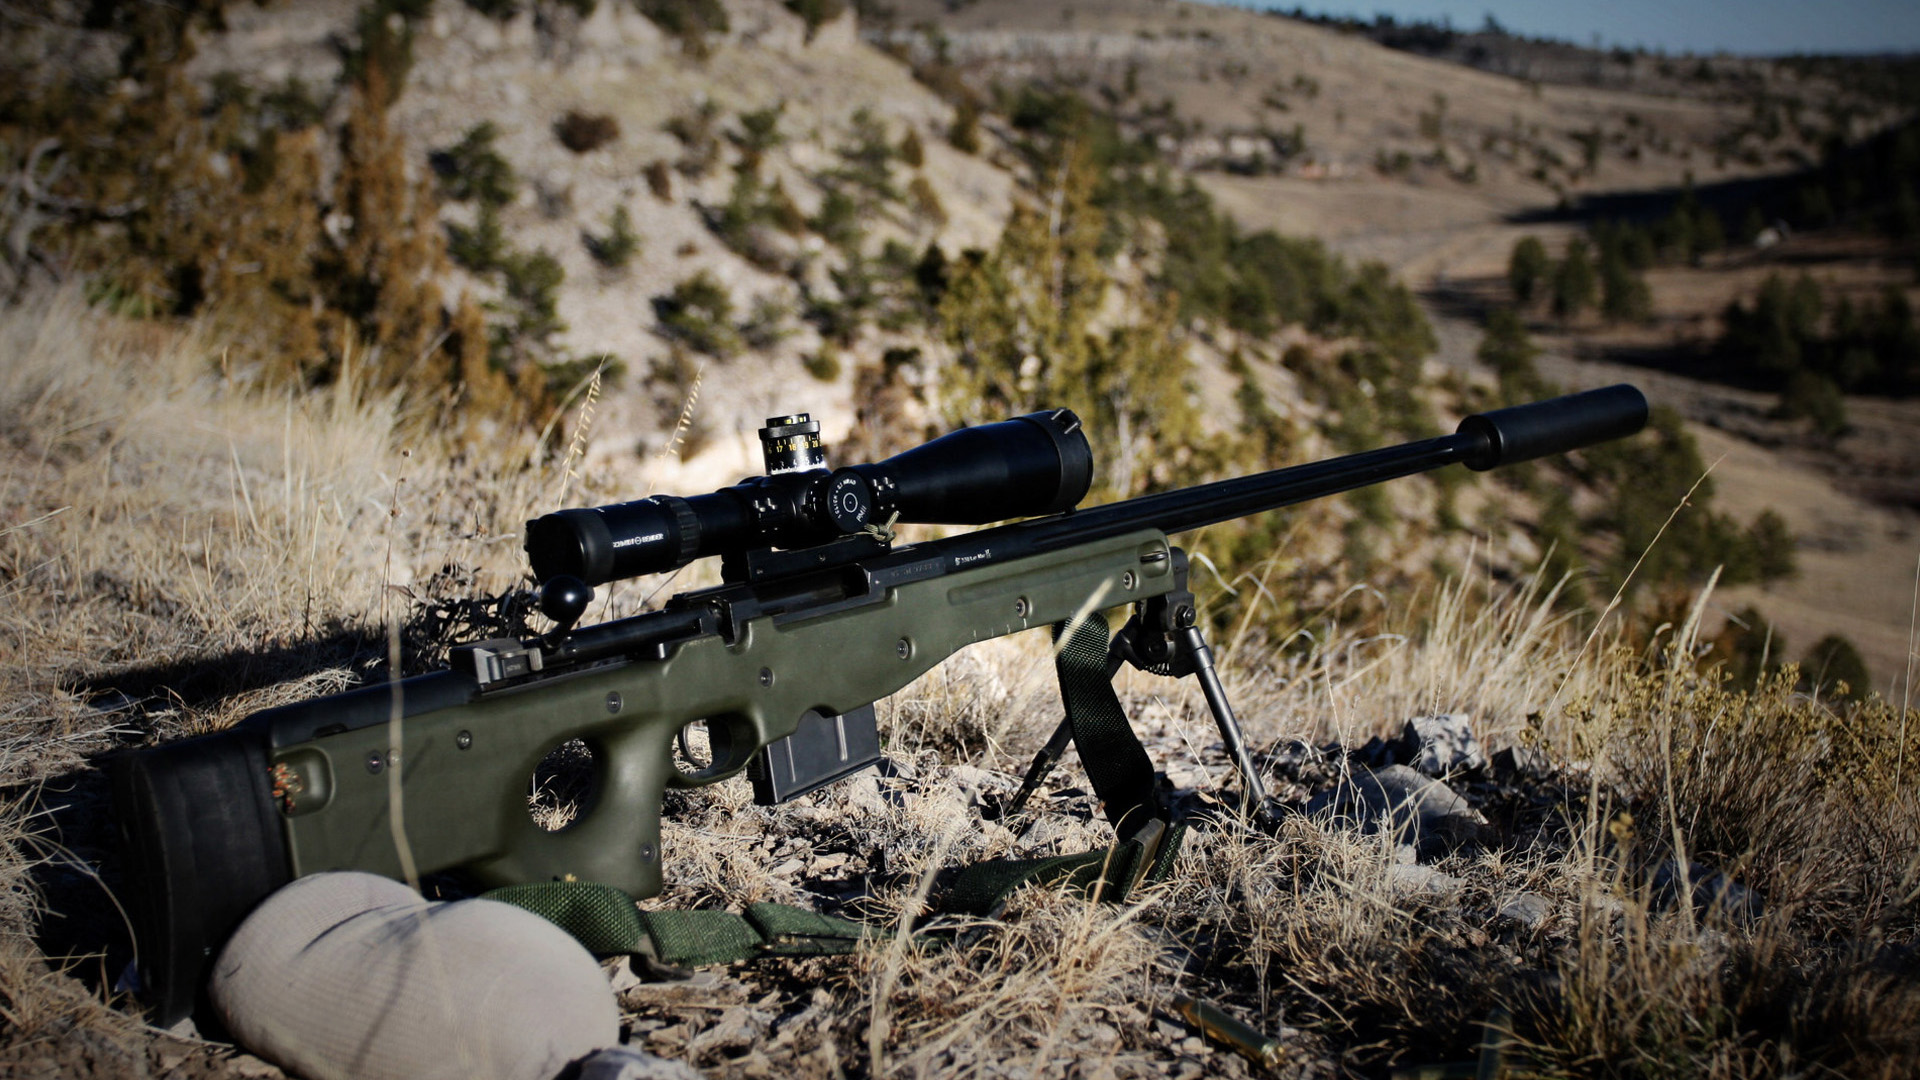 L96A1 sniper rifle Wallpapers HD Wallpaper Downloads 1920x1080